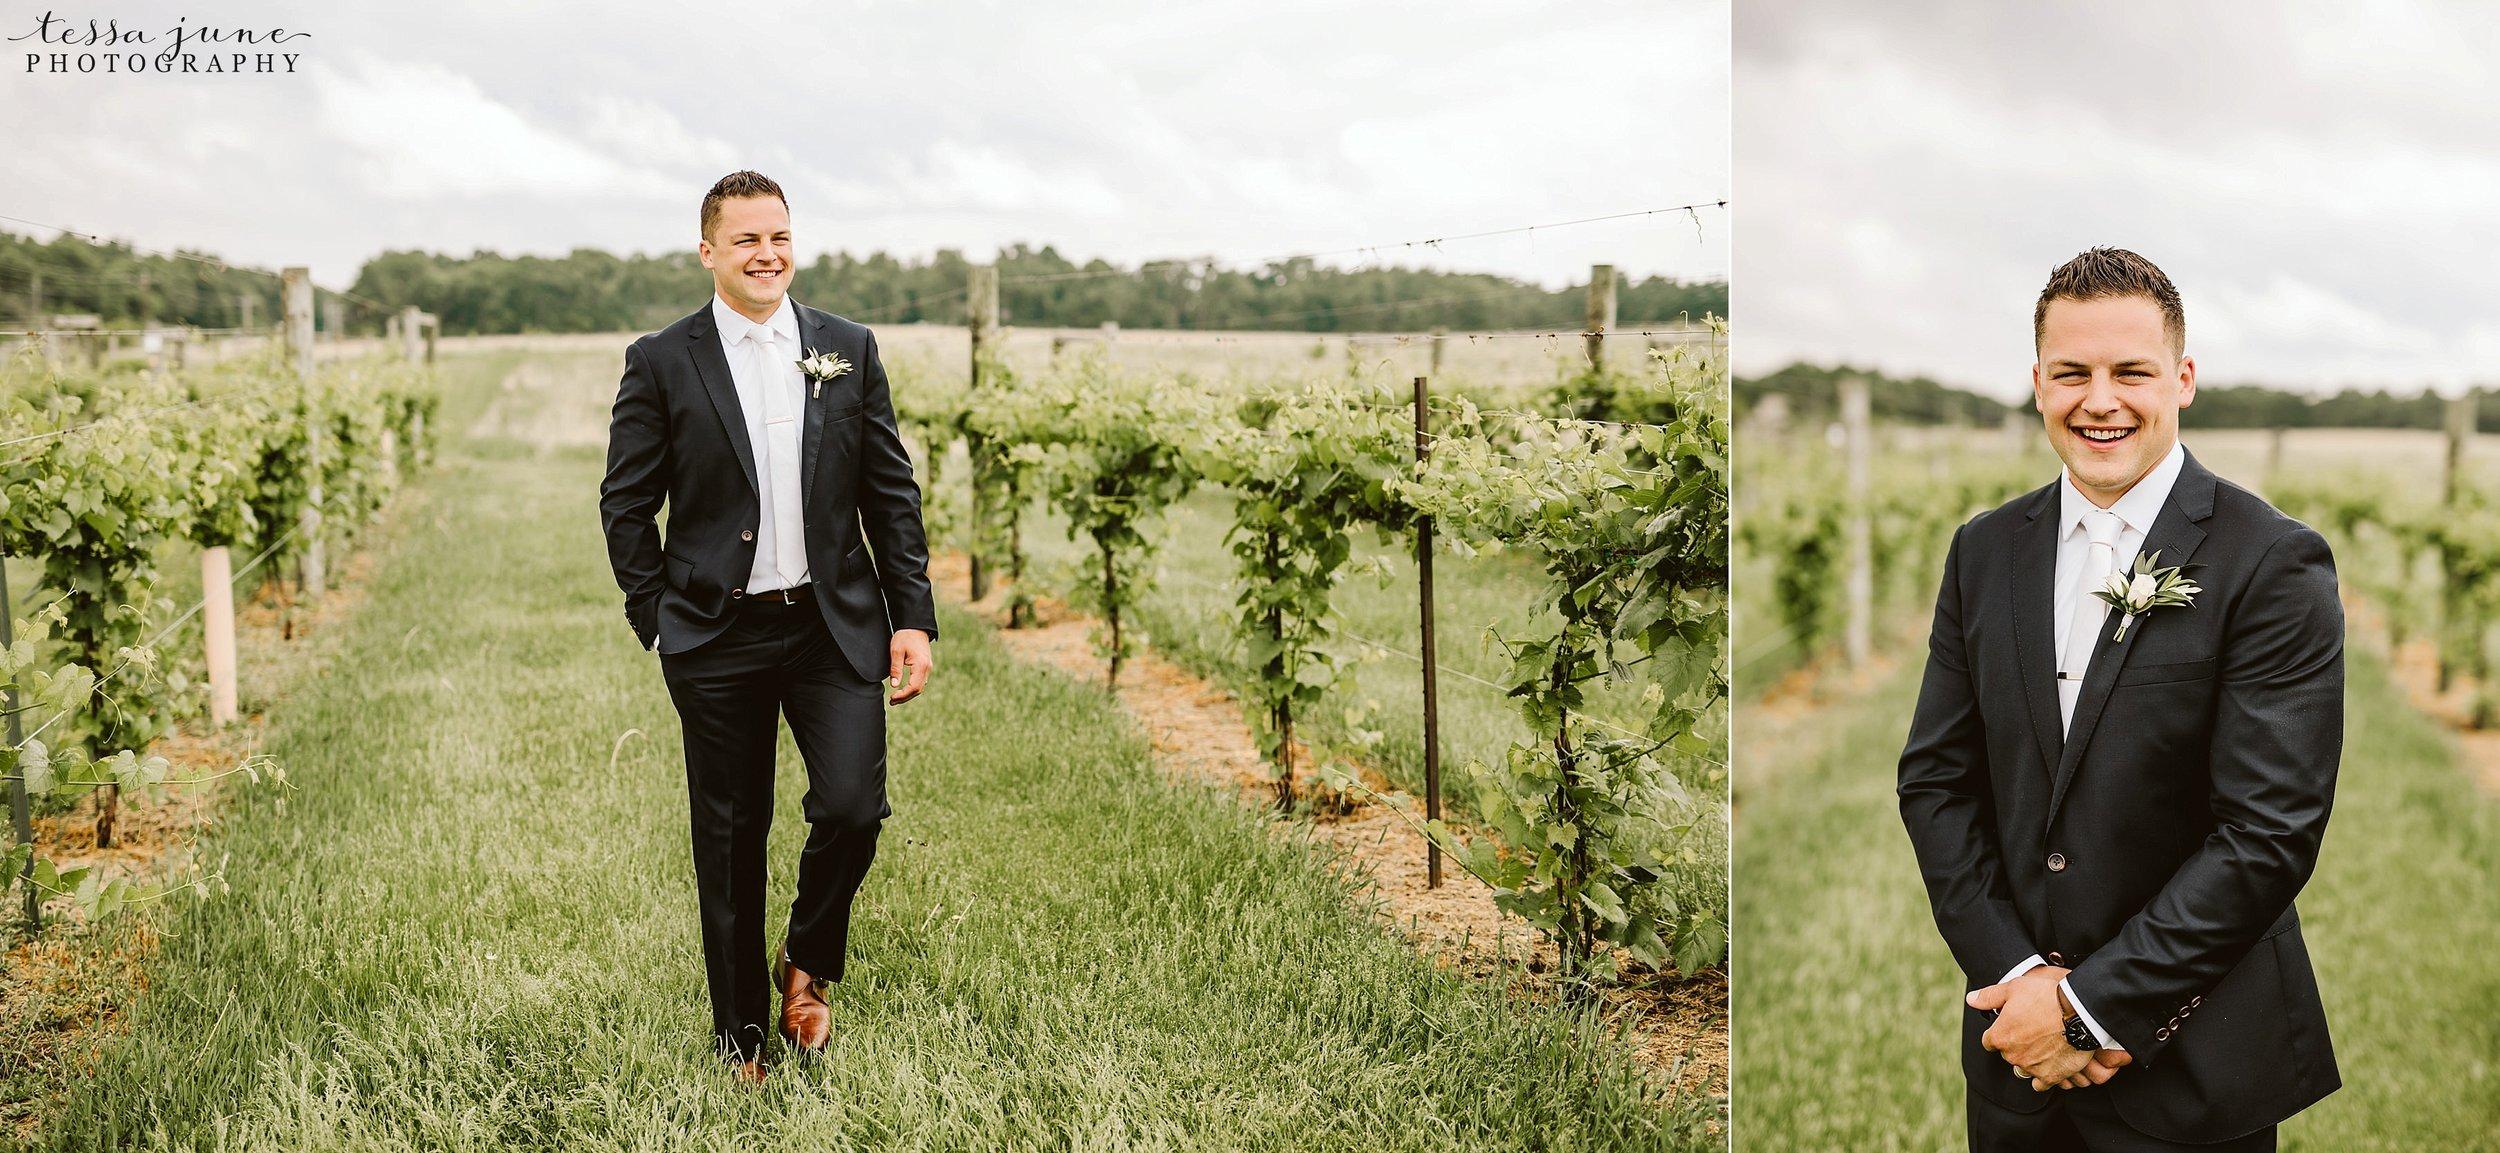 carlos-creek-winery-wedding-summer-pristine-floral-blush-pink-navy-alexandria-minnesota-69.jpg